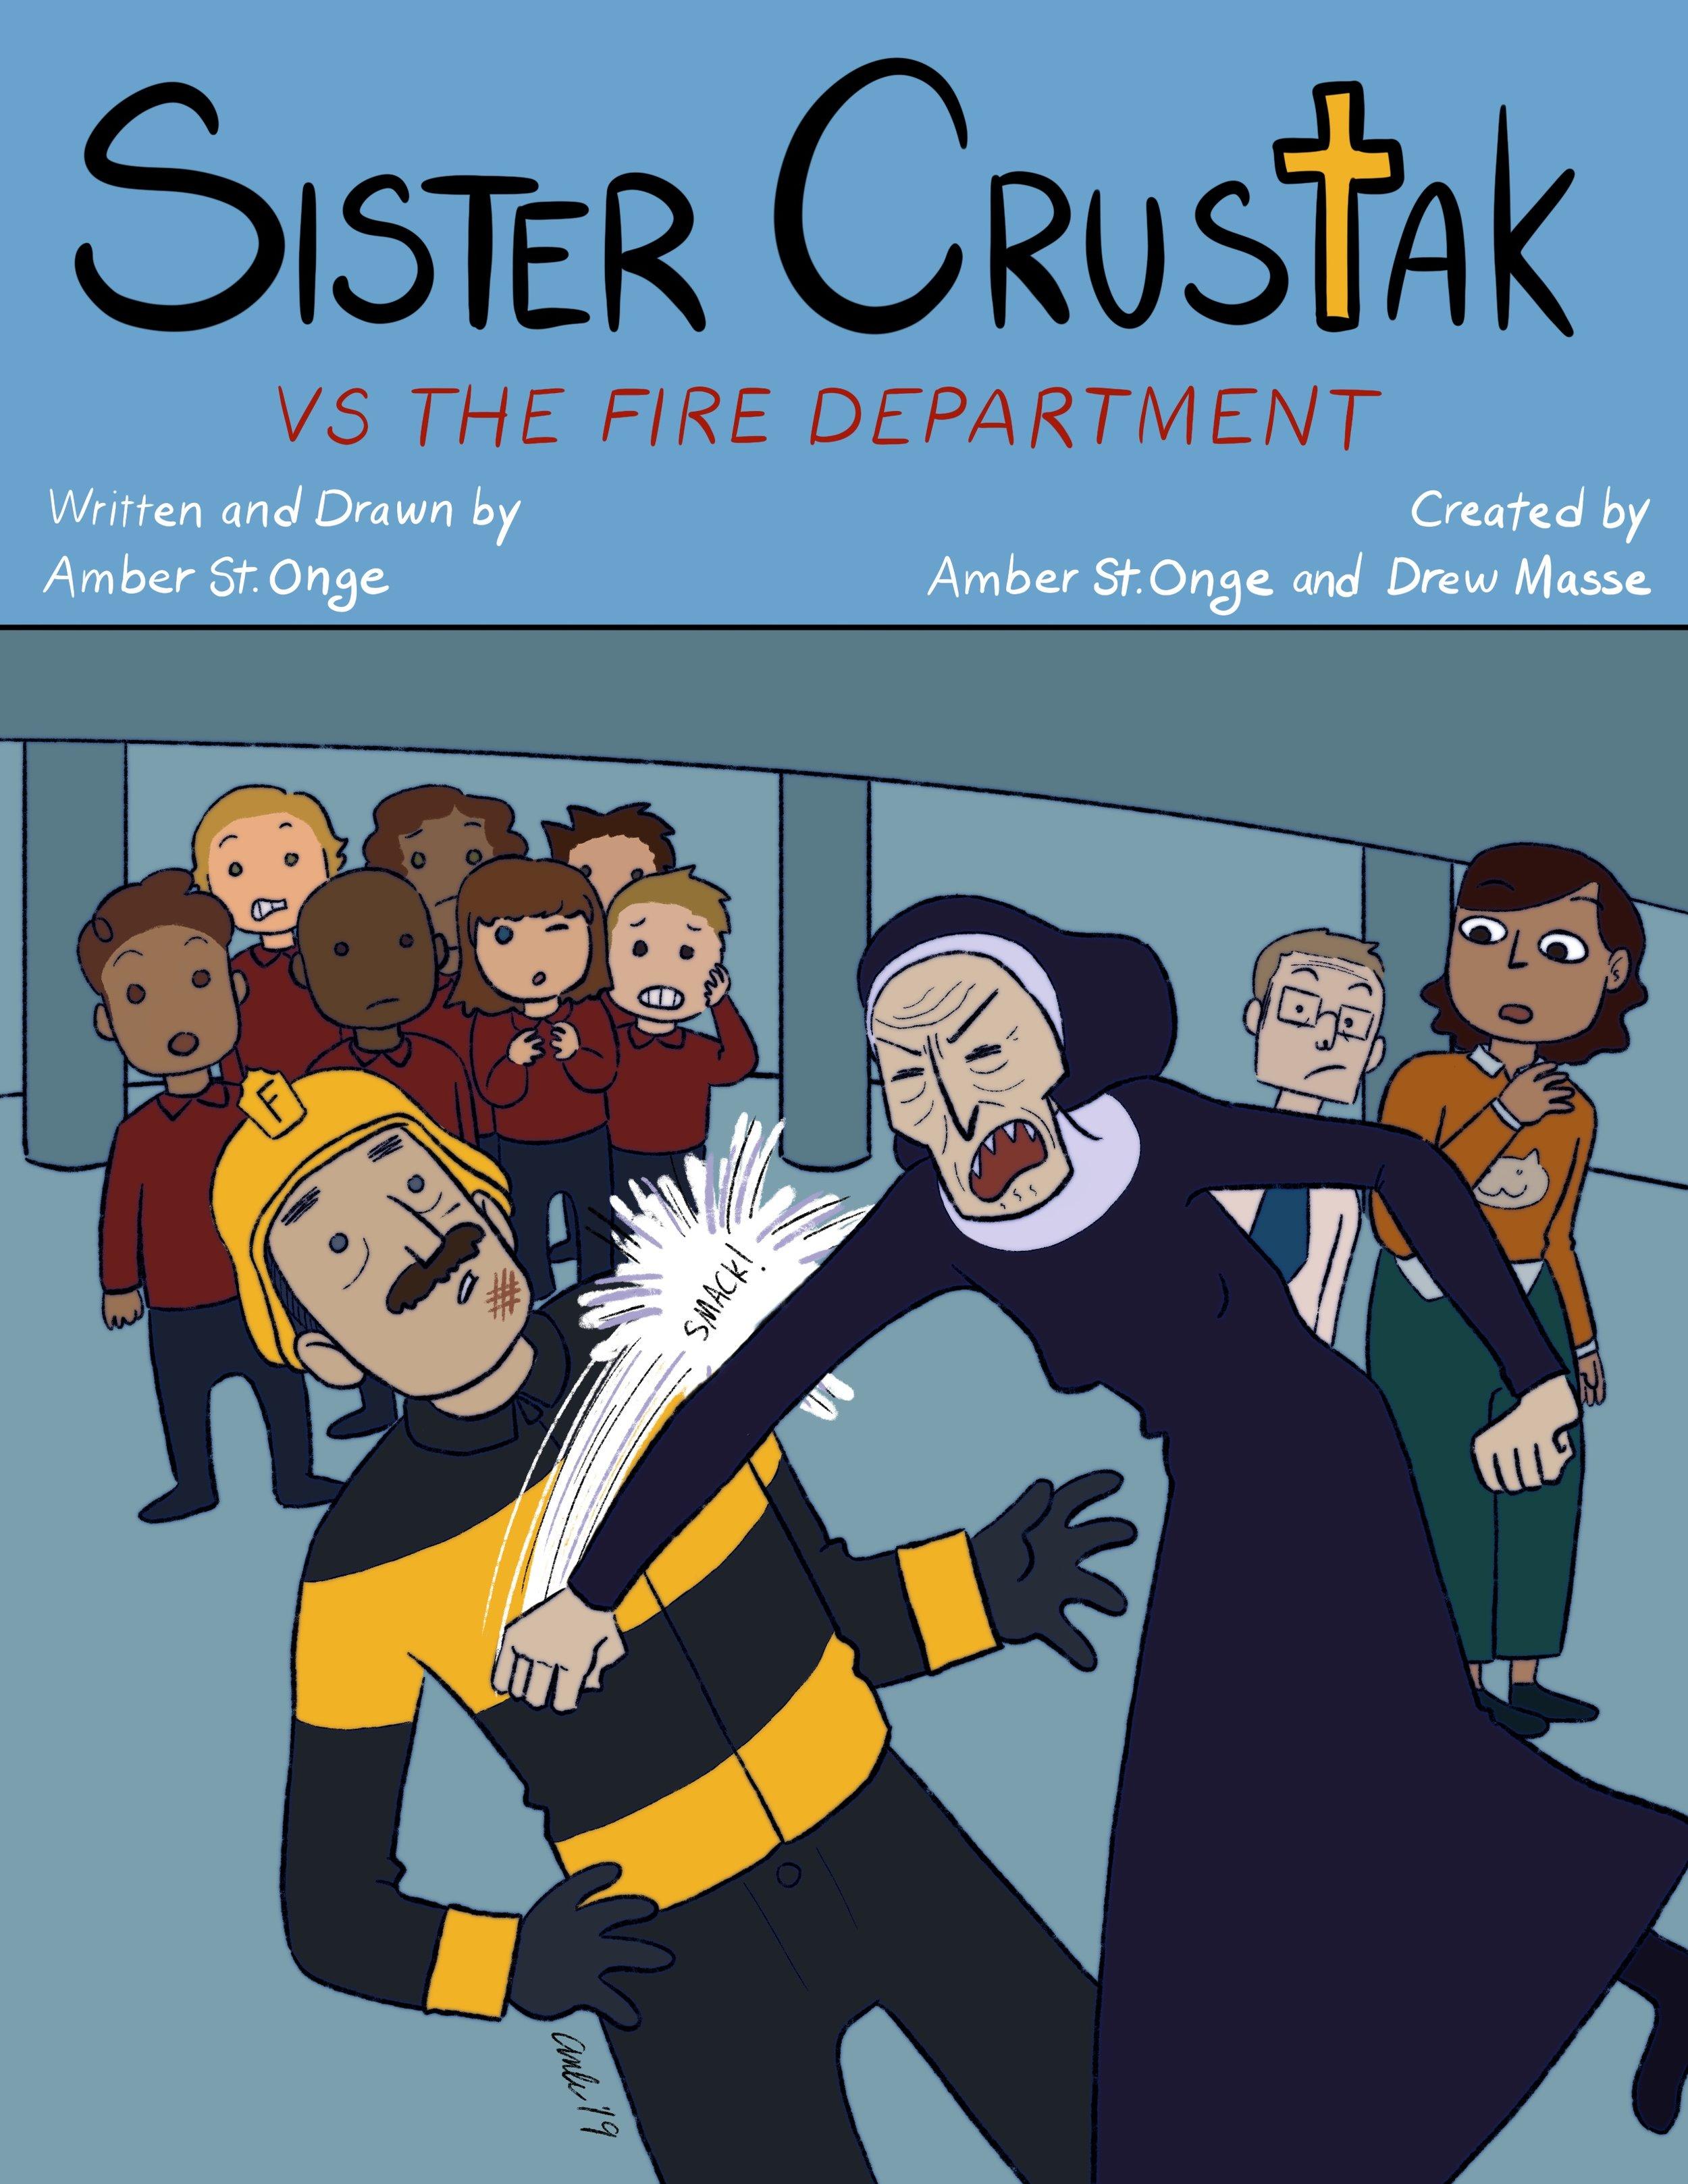 Sis_Crustak_Cover.jpg